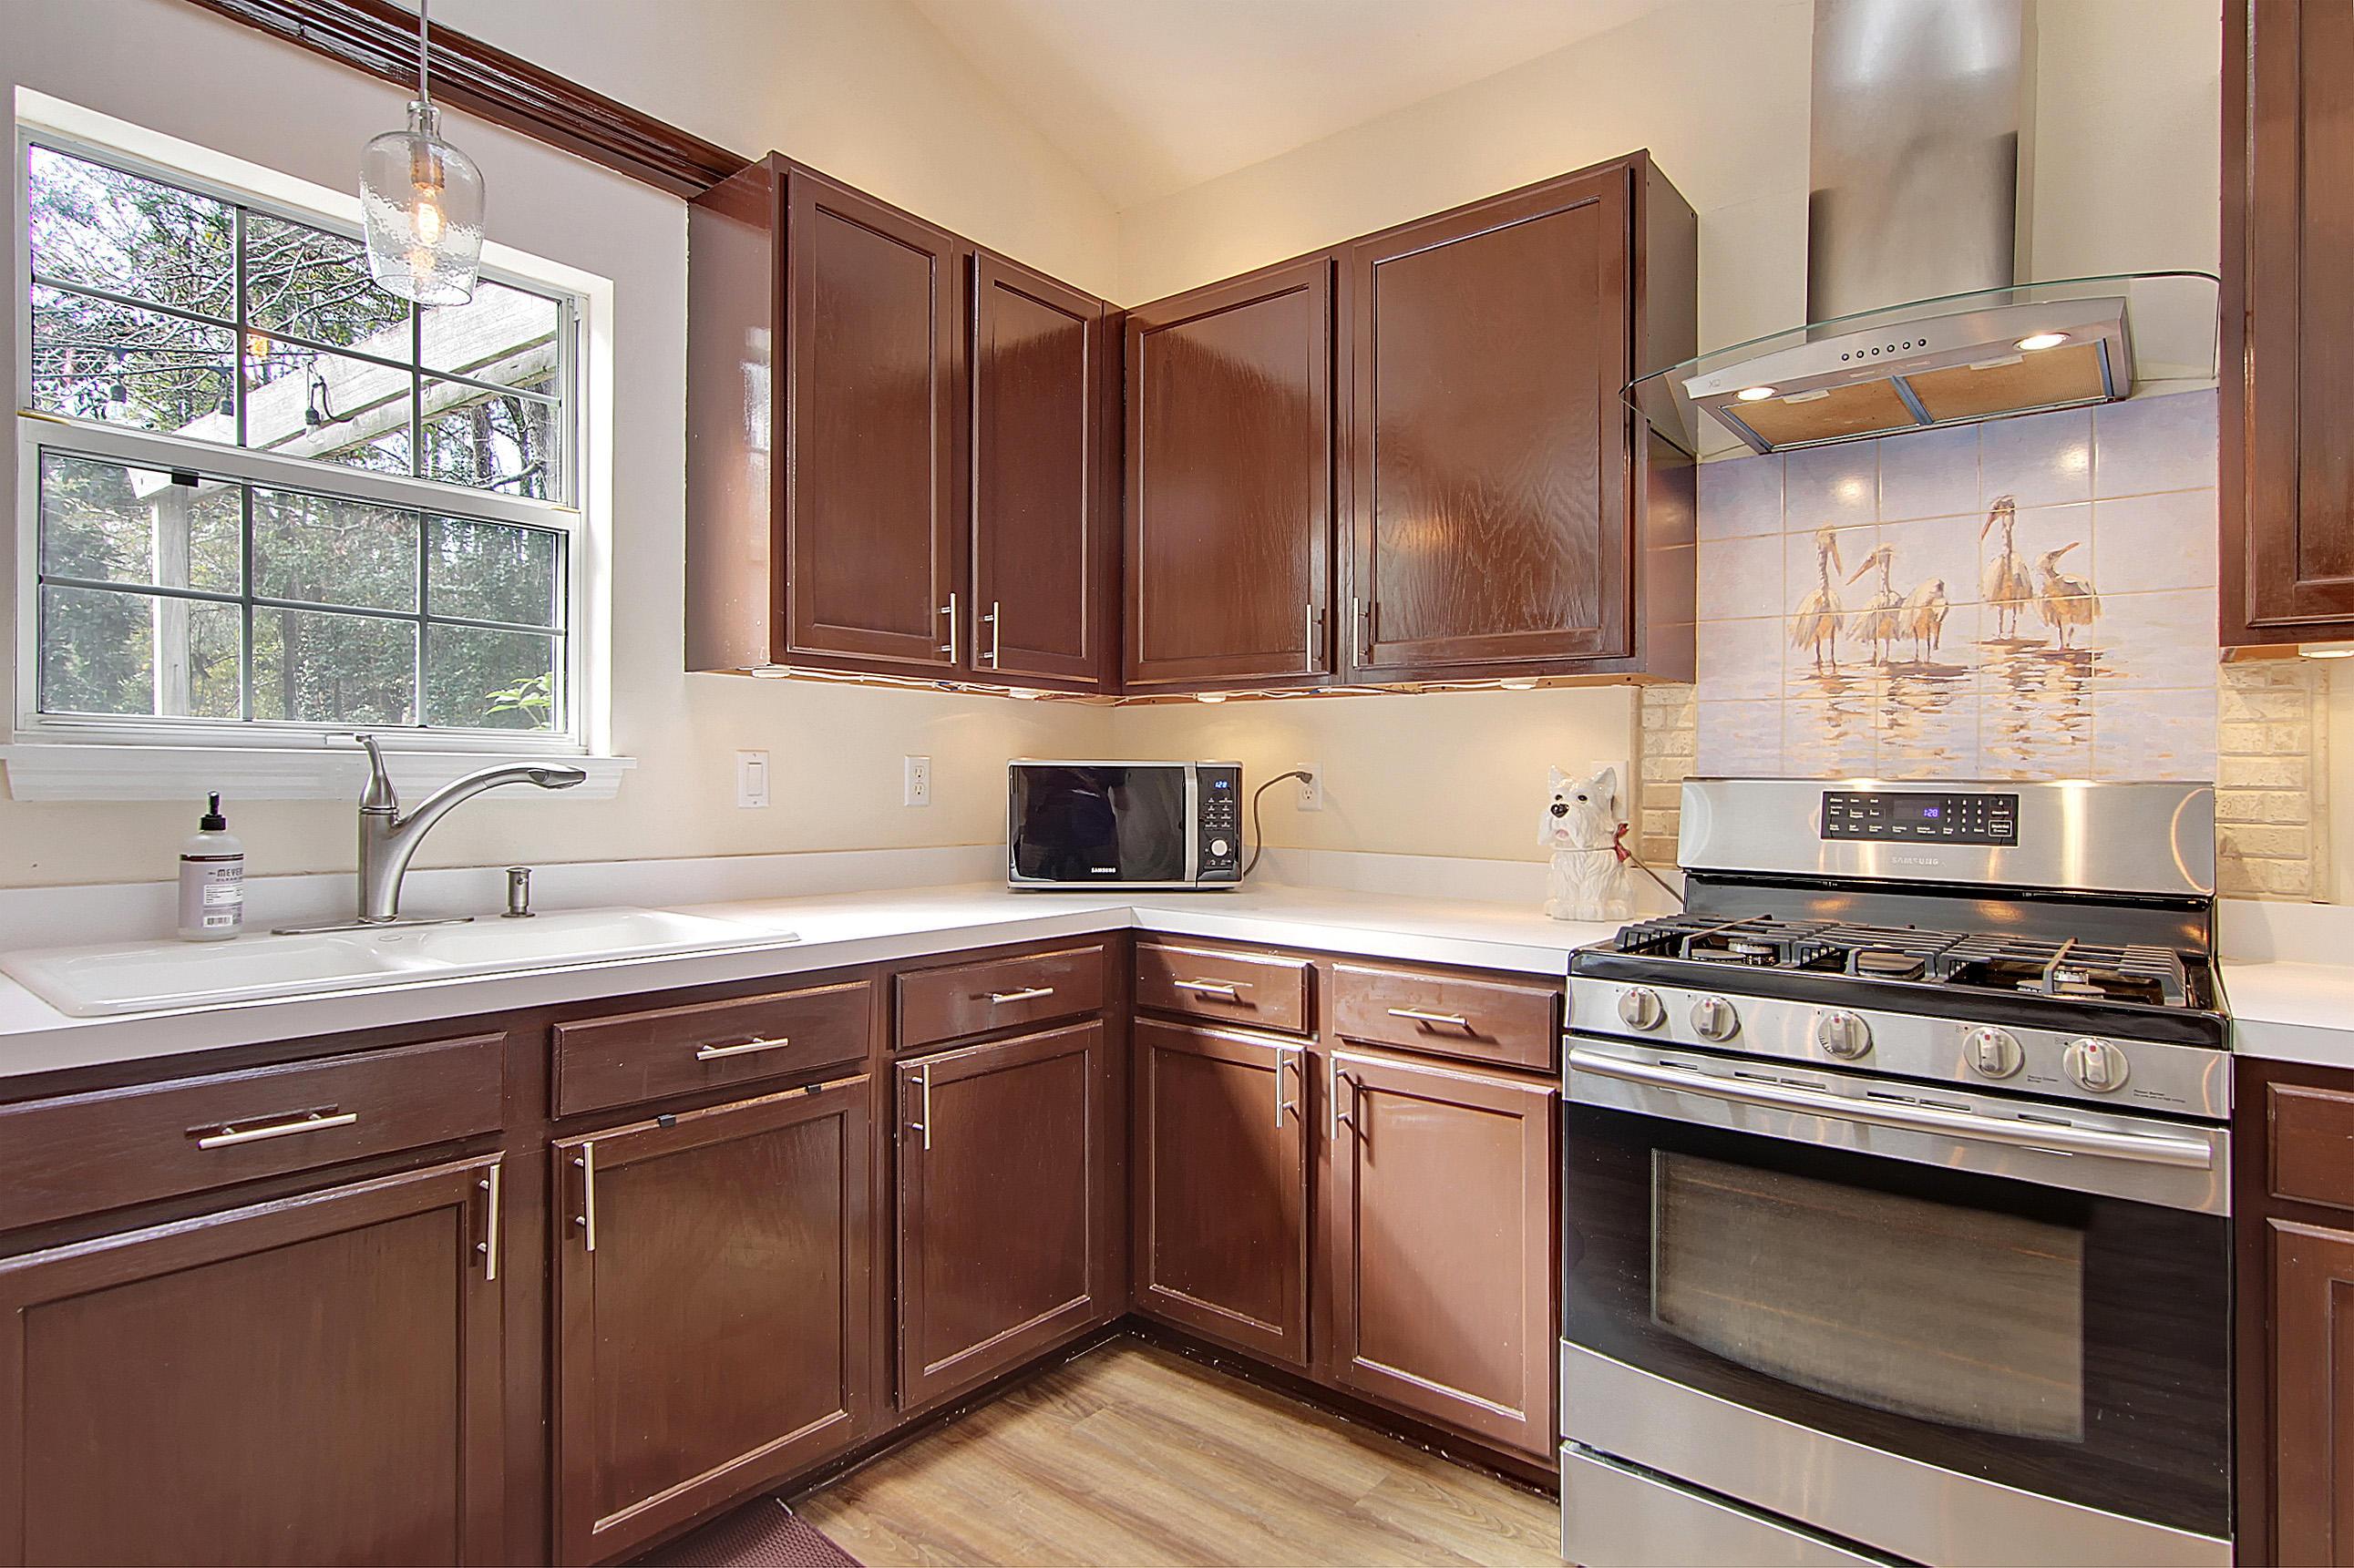 Brickyard Plantation Homes For Sale - 1169 Park View, Mount Pleasant, SC - 23